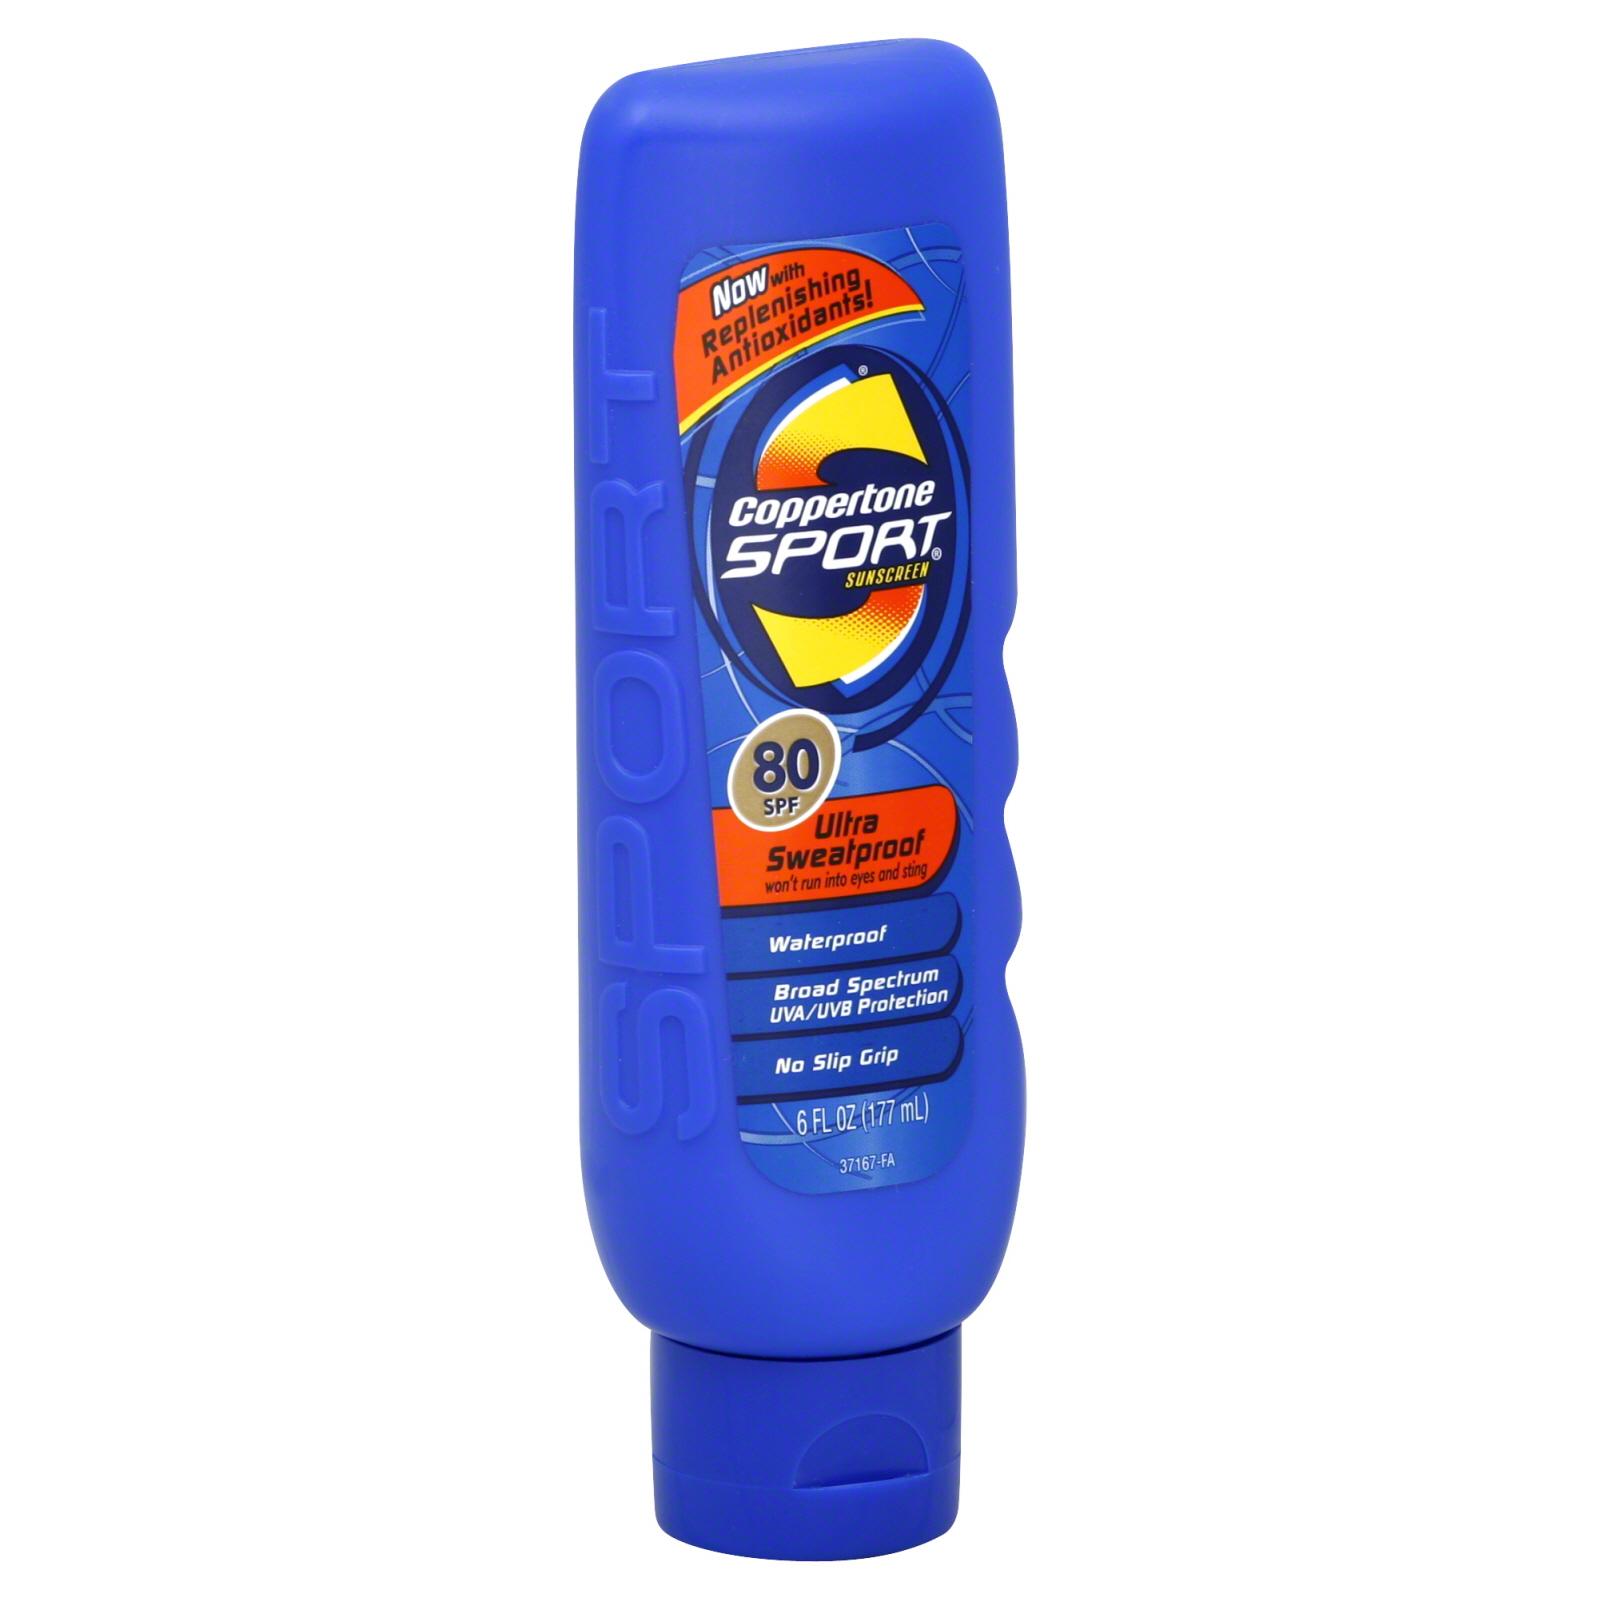 Coppertone Sport Sunscreen Spf 70 6 Fl Oz 177 Ml